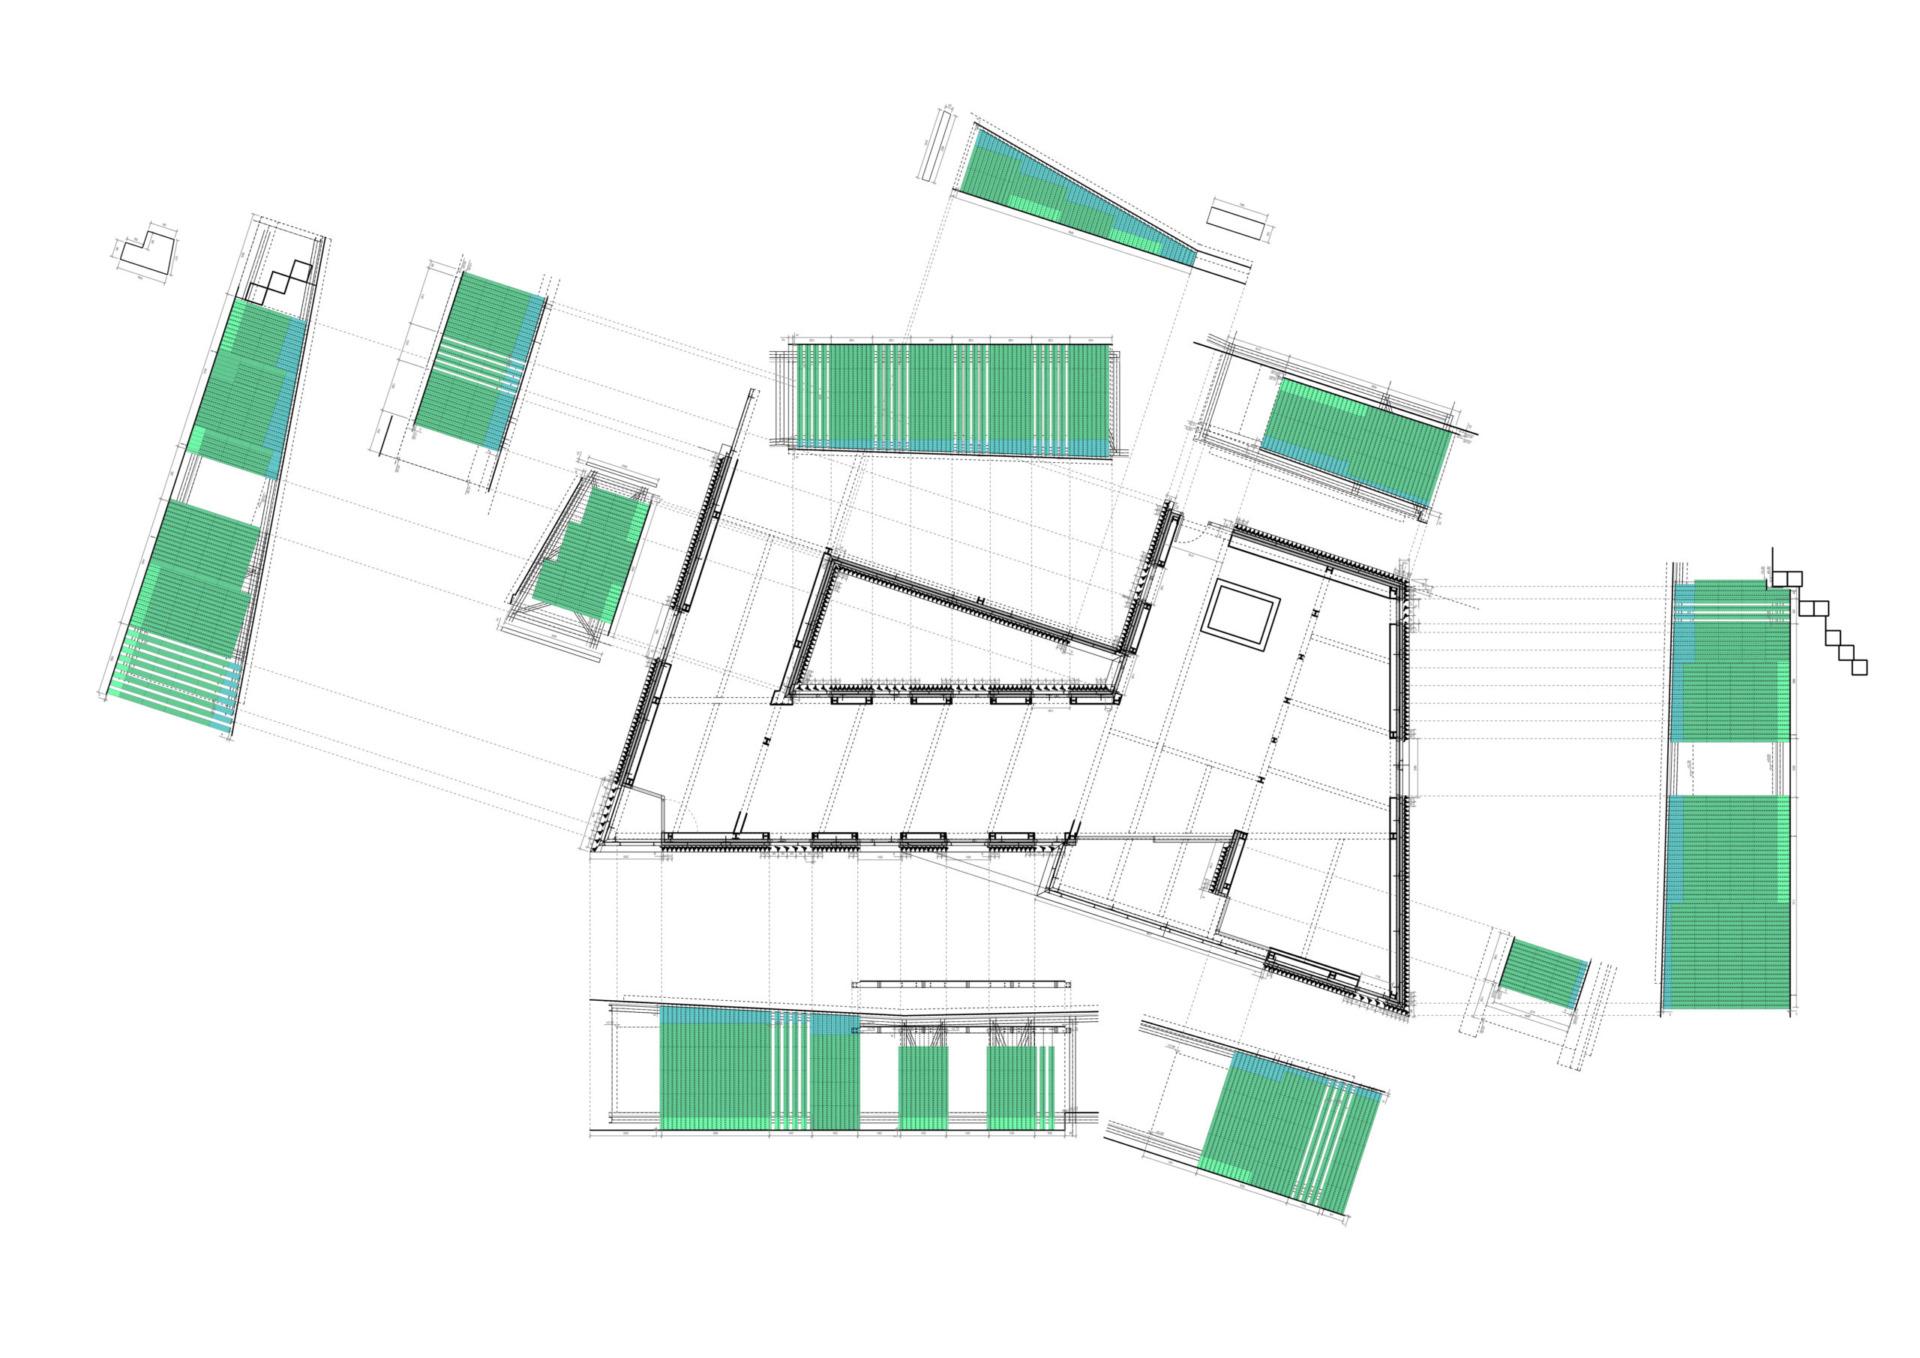 Sala Ferusic Architects Happy House Carles Sala Relja Ferusic